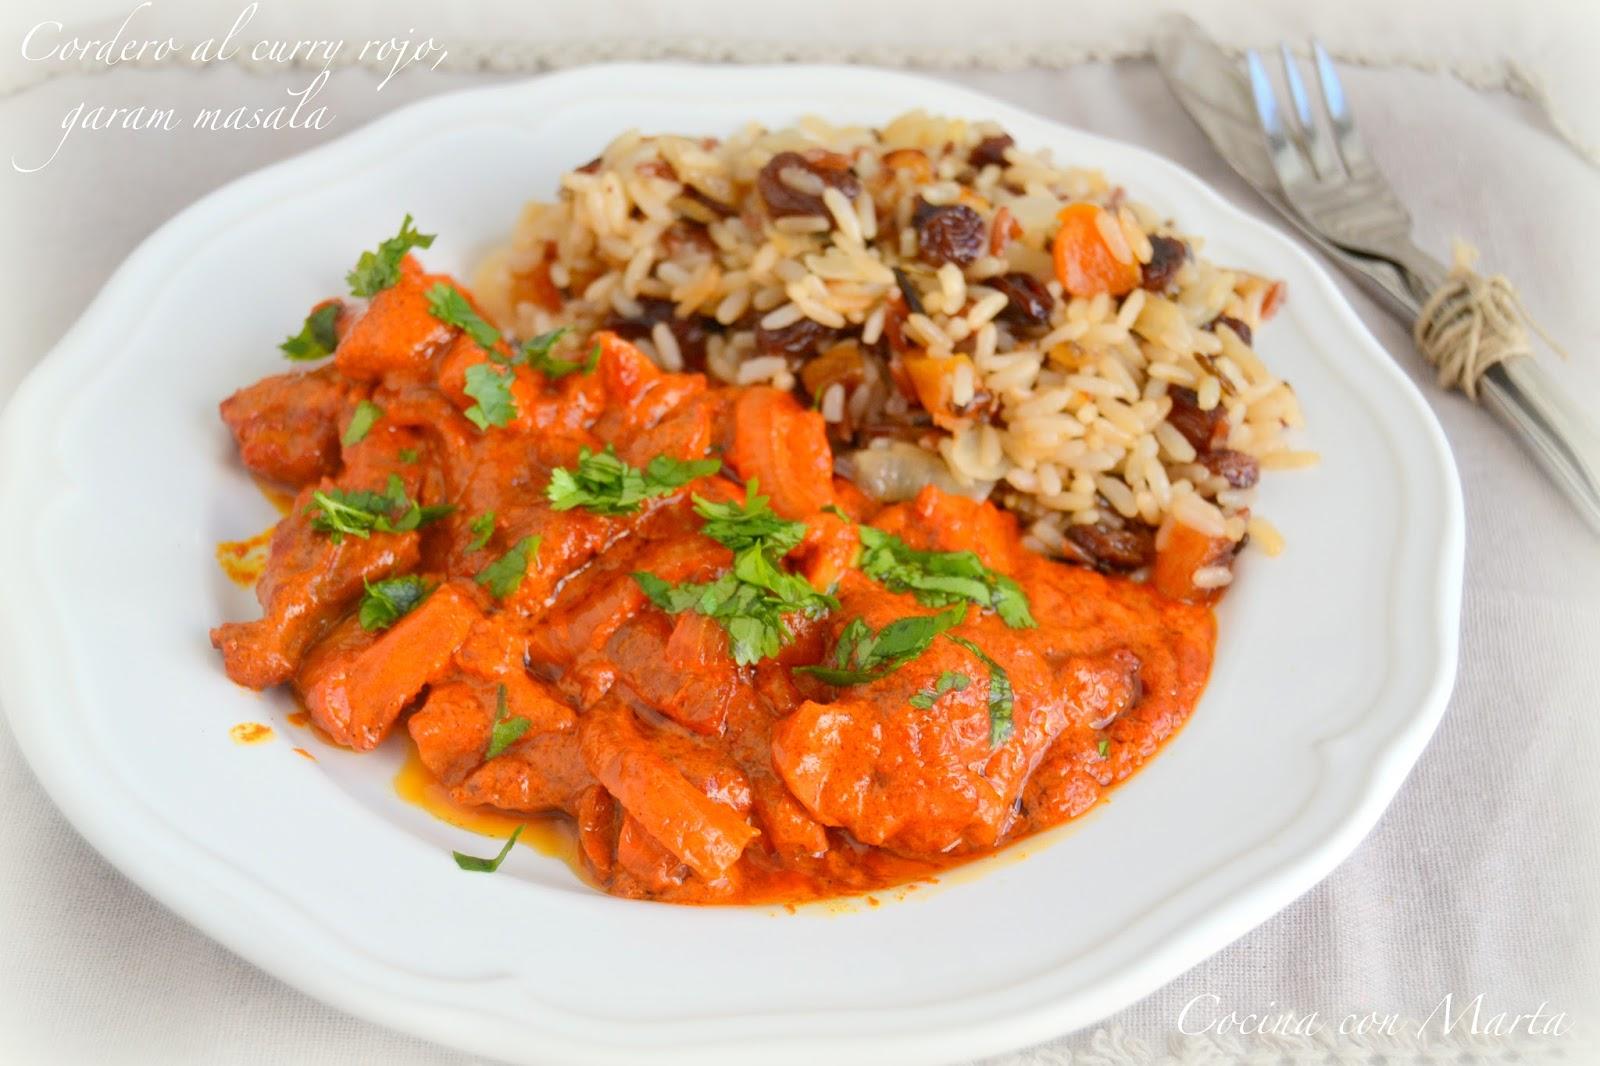 Cordero al curry rojo, garam masala